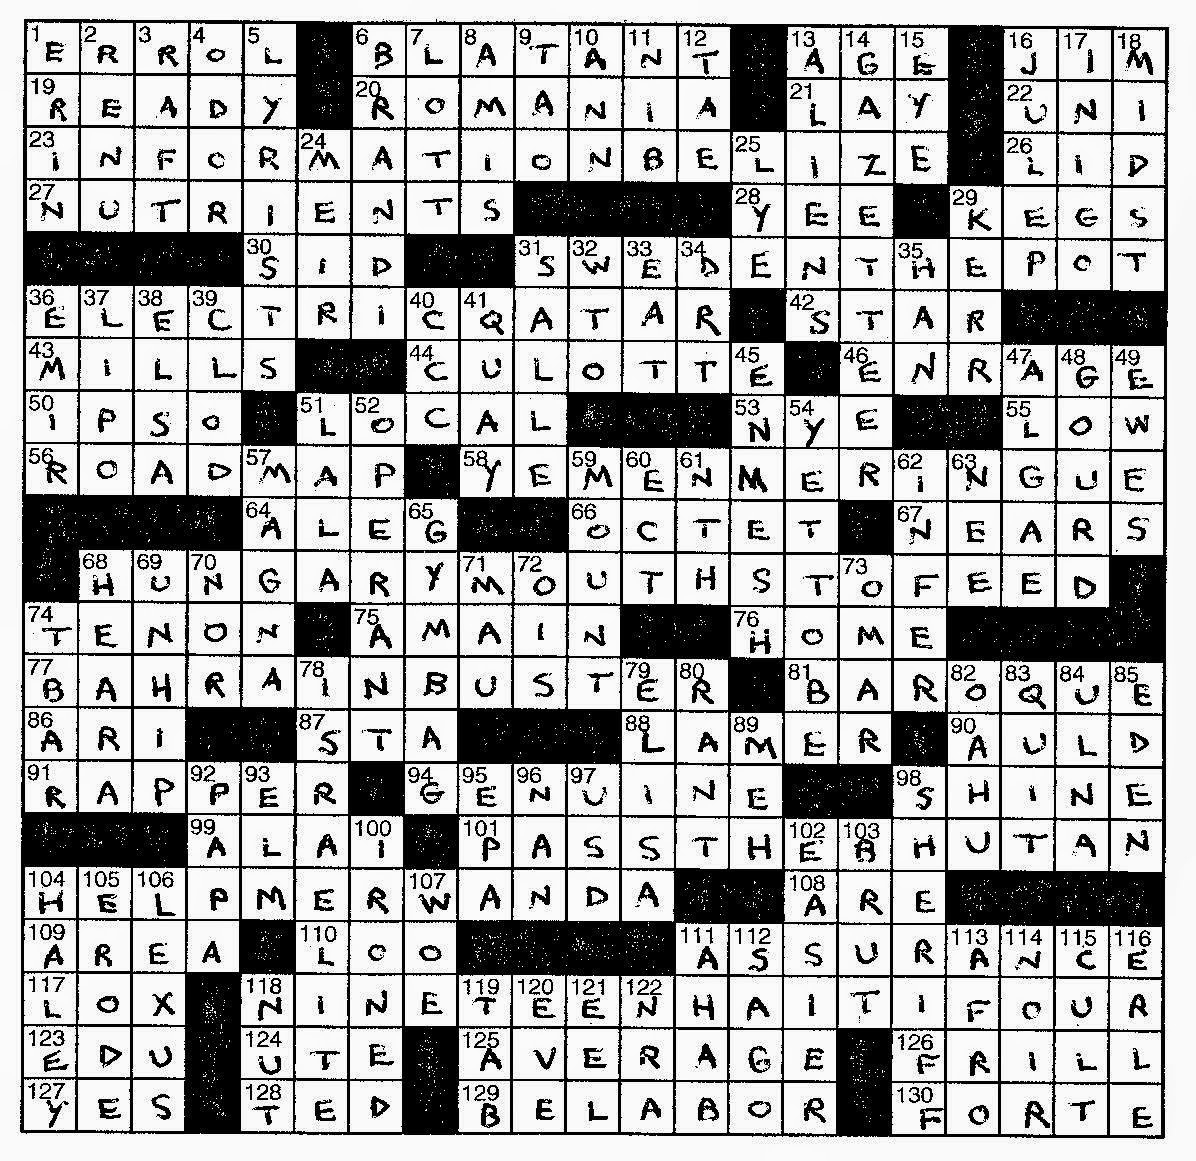 Lem's Levity: Port Cities - Printable Crossword Puzzles By Frank Longo